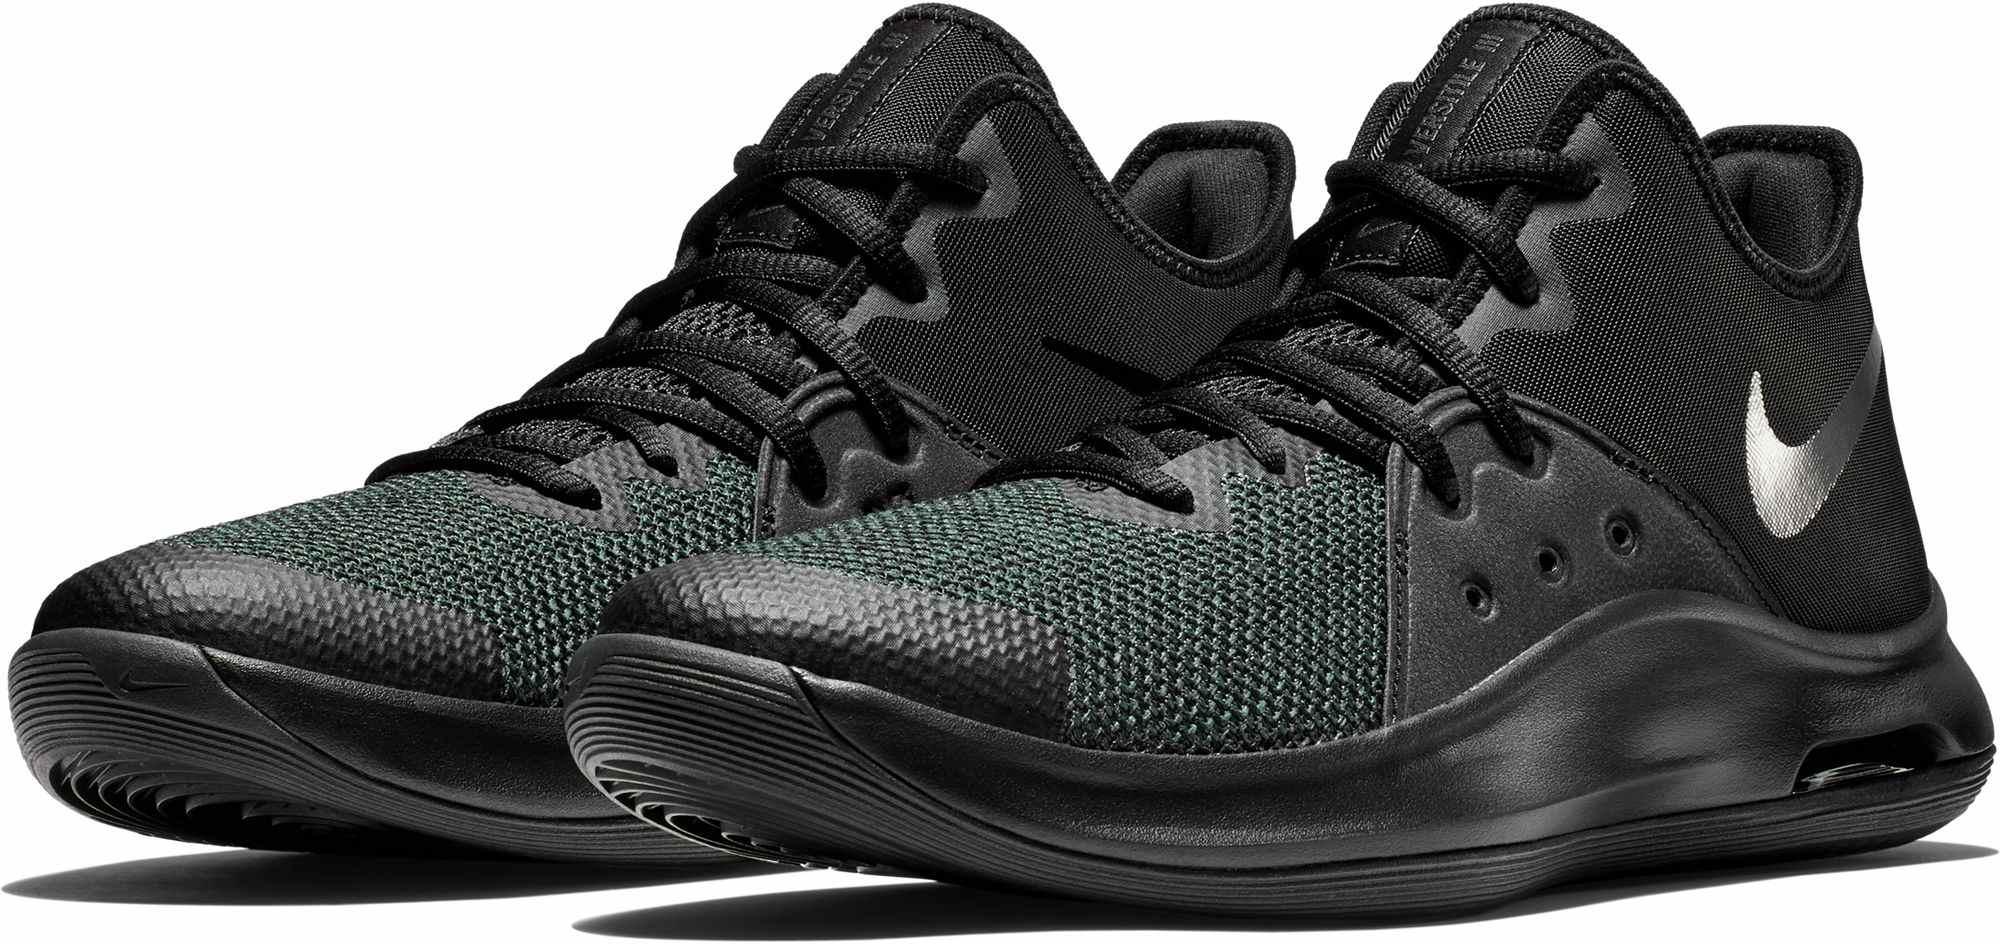 Nike AIR VERSITILE III. Pánska basketbalová obuv. Pánska basketbalová obuv.  Pánska basketbalová obuv 223e4aa8e37